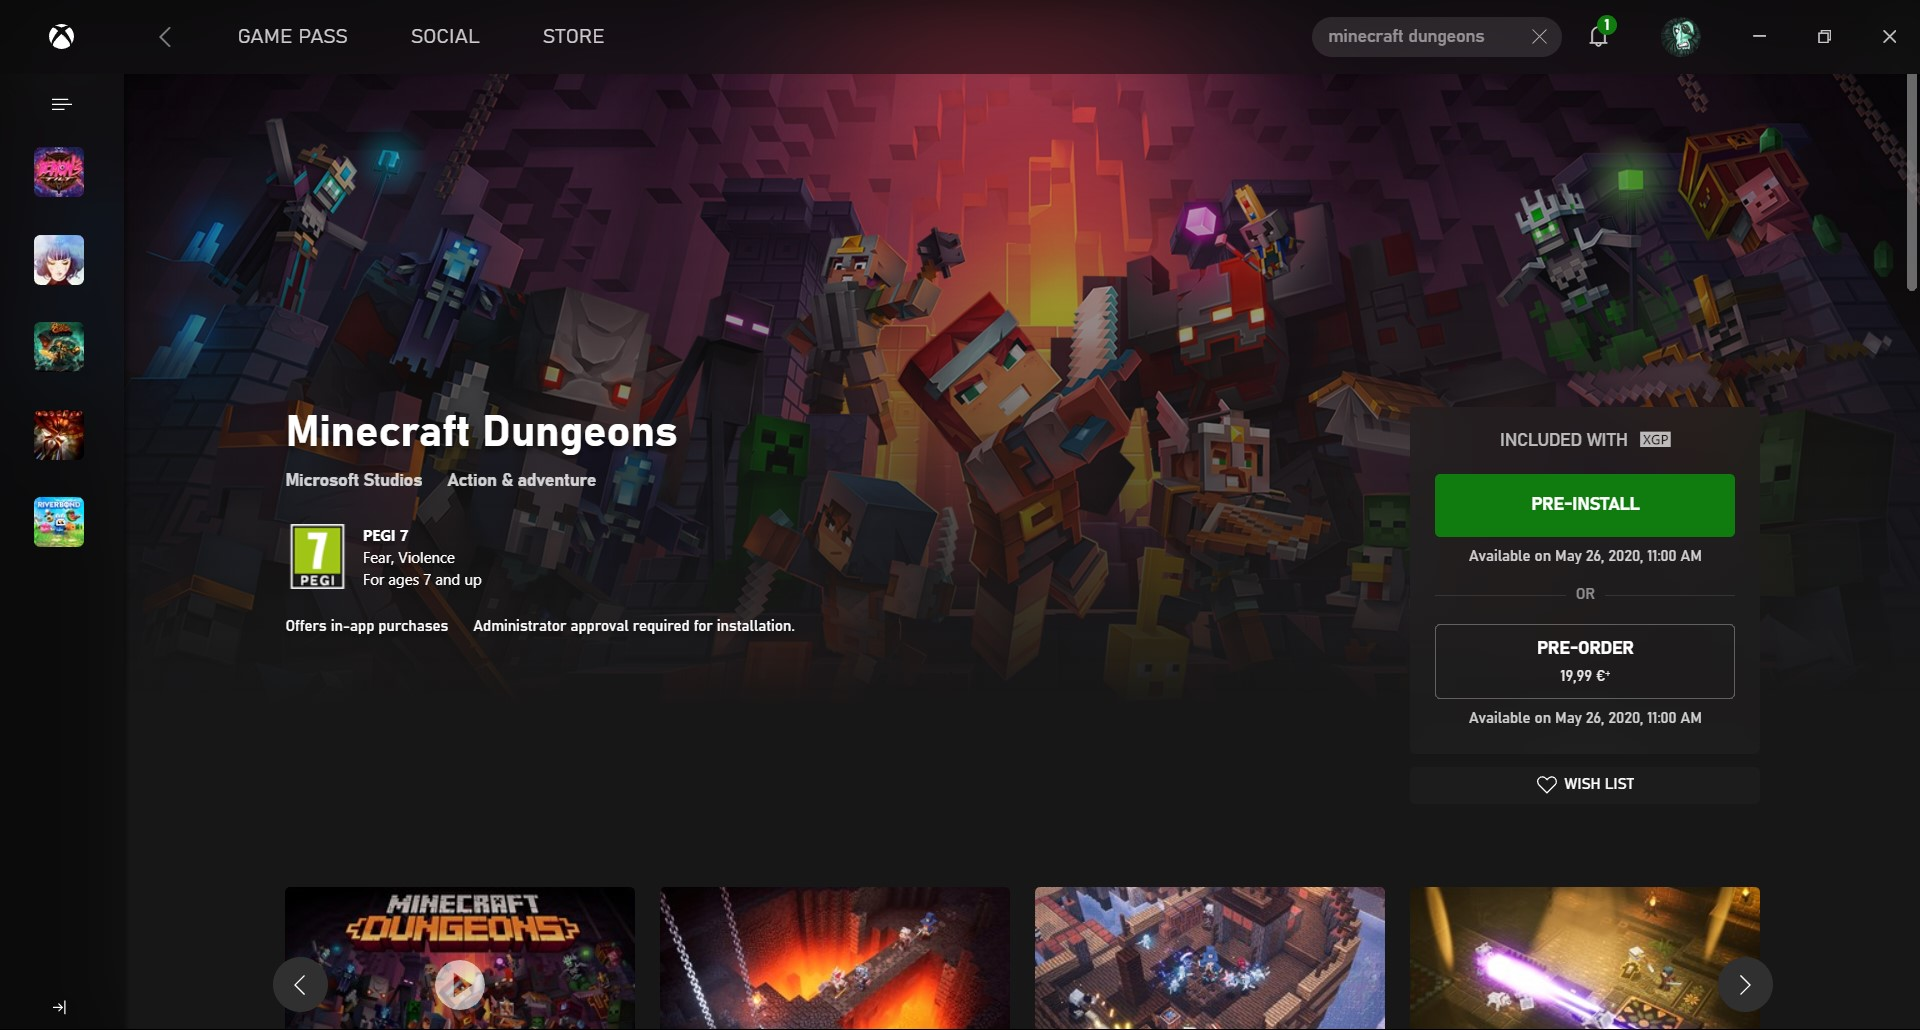 Minecraft Dungeons : Διαθέσιμος για Pre-Load ο νέος τίτλος των Mojang Studios